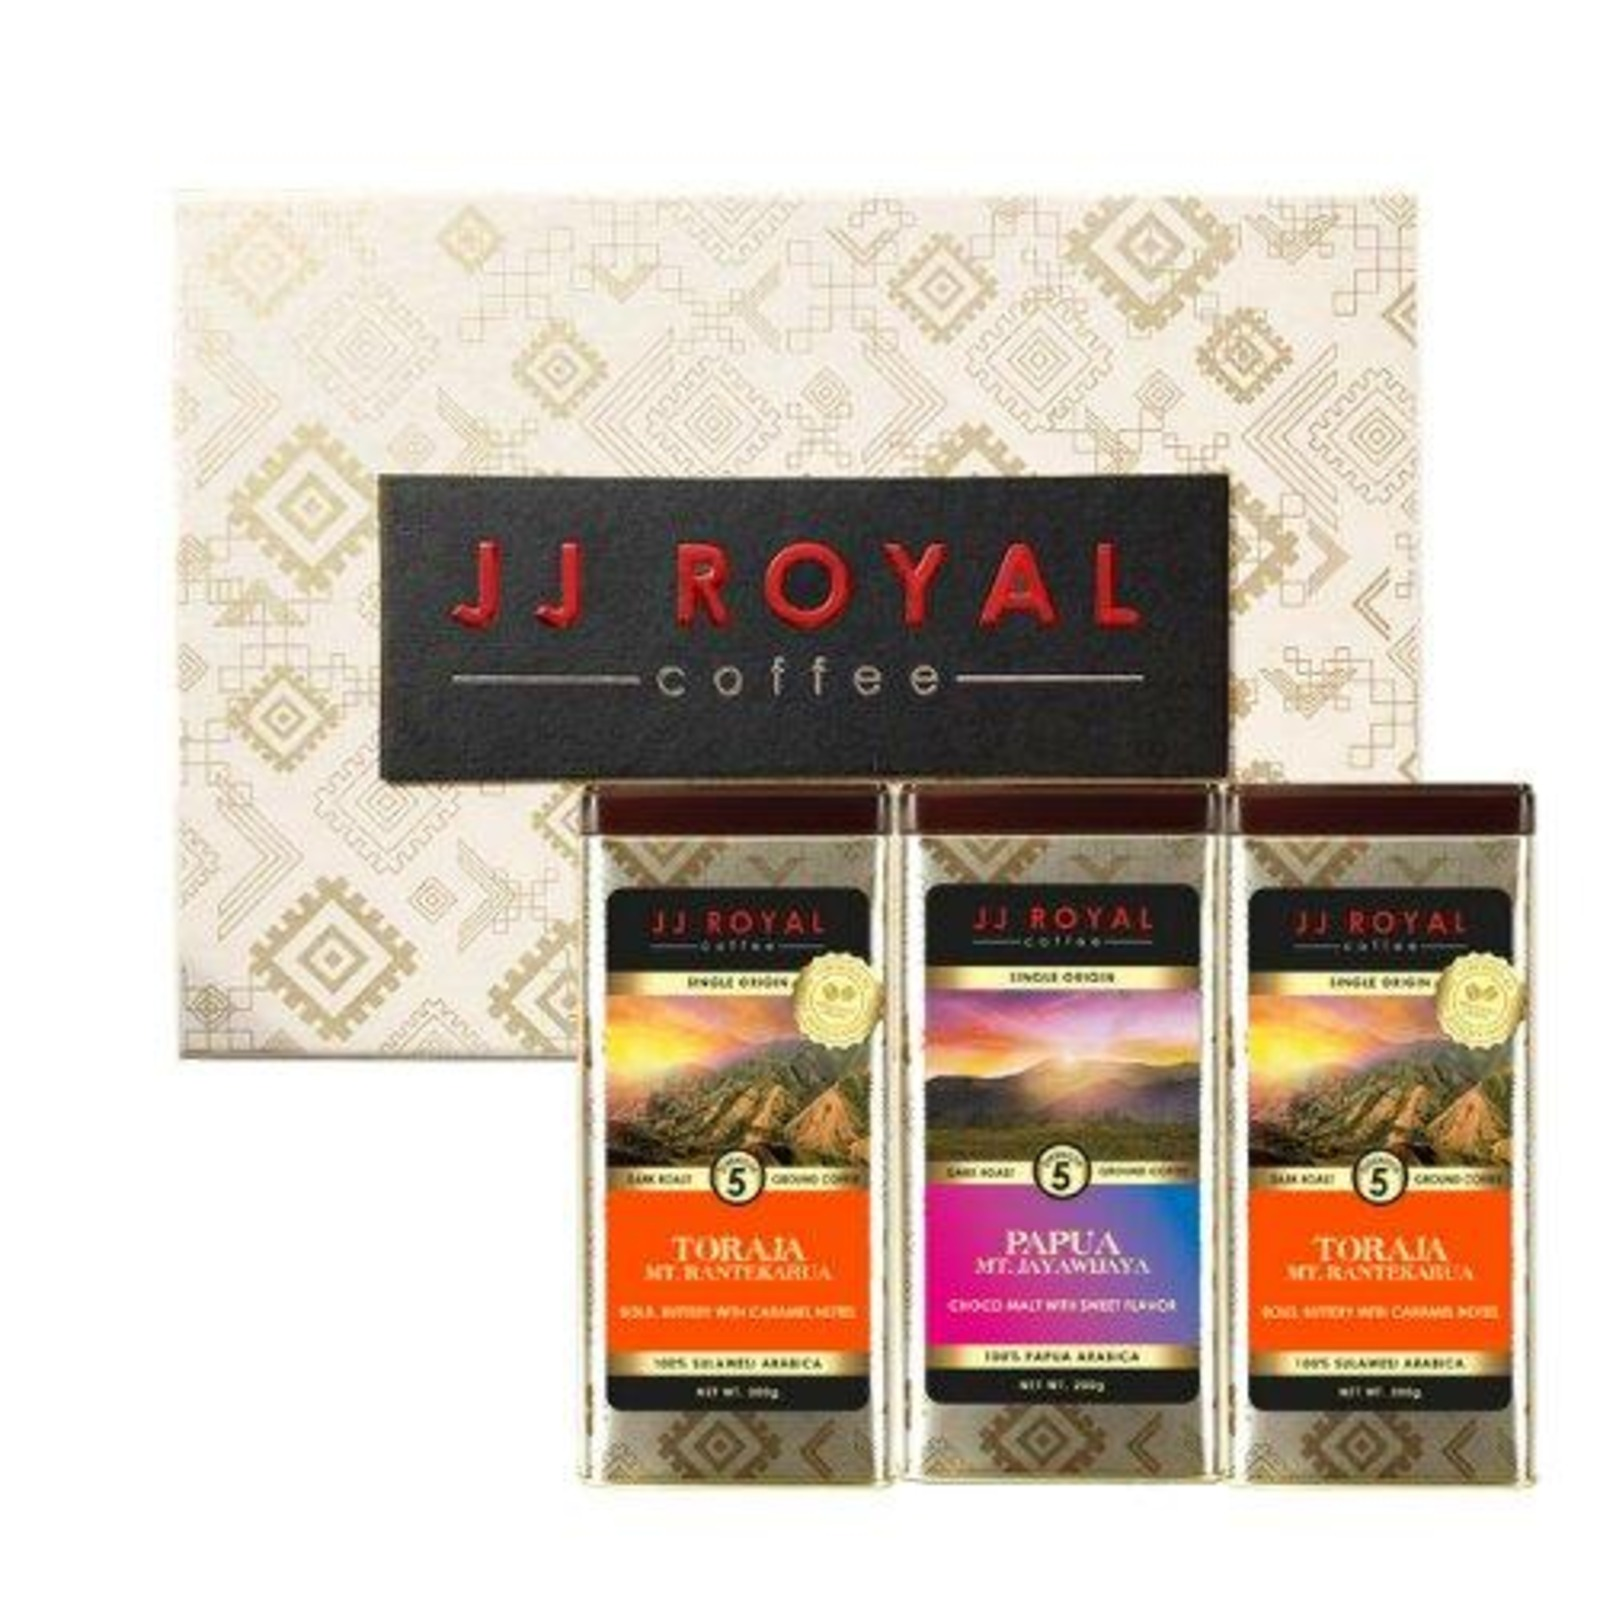 JJ Royal Coffee - Toraja & Papua Coffee Bean Trio